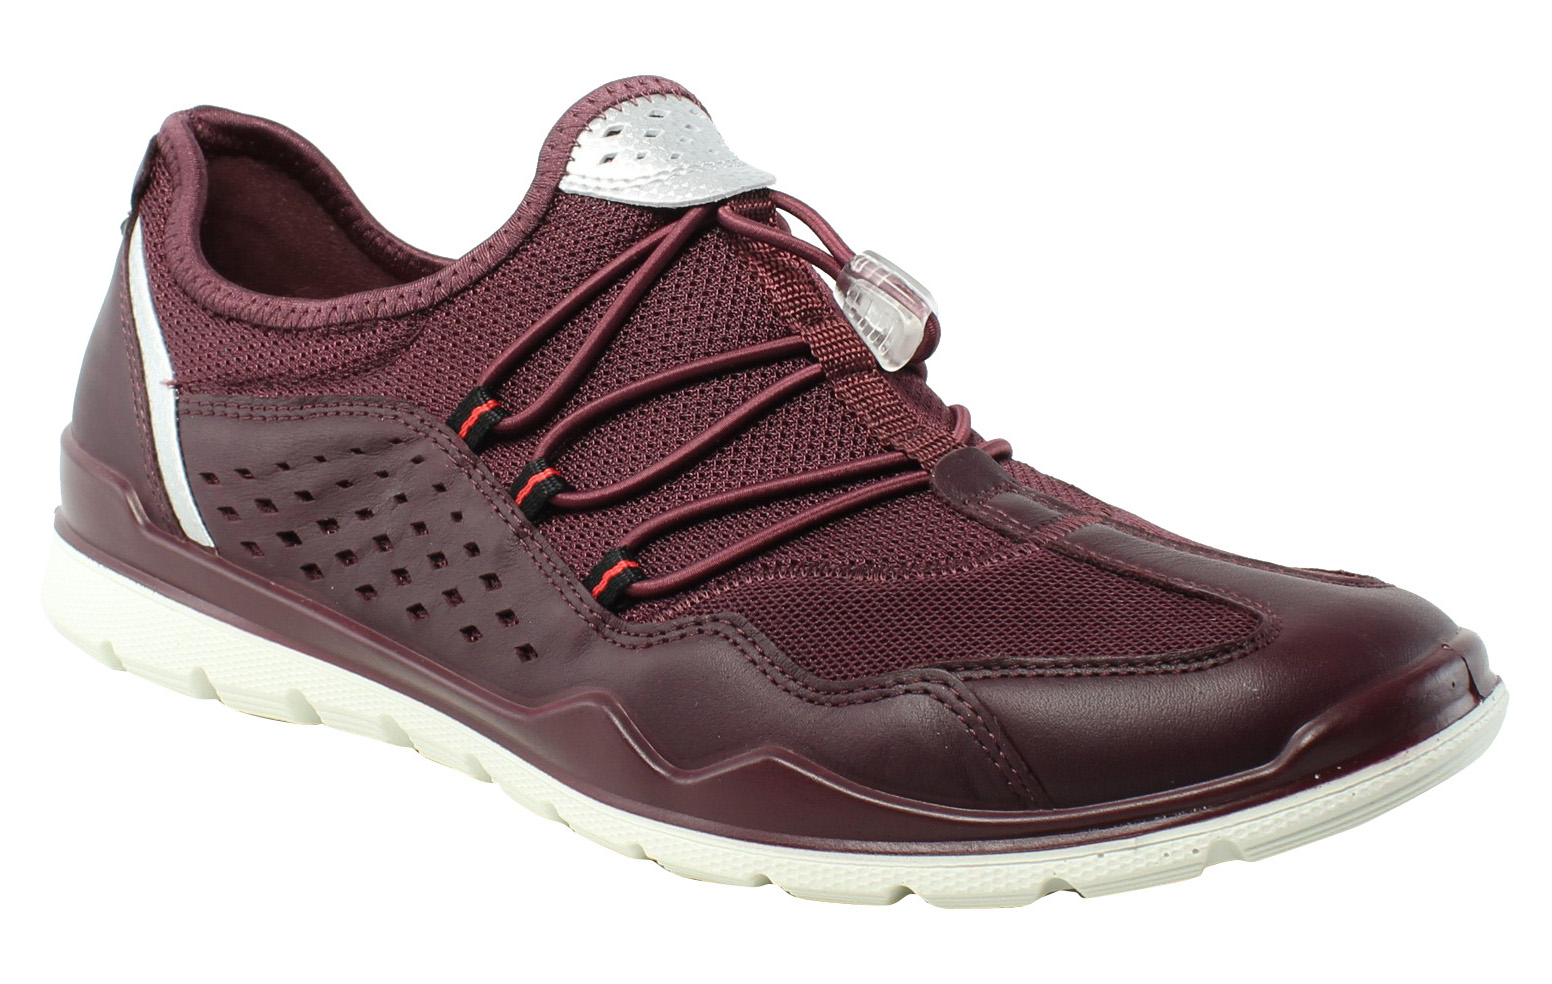 ECCO Womens Ardor Bordeaux Bordeaux Running Shoes Size 9.5 New by Ecco